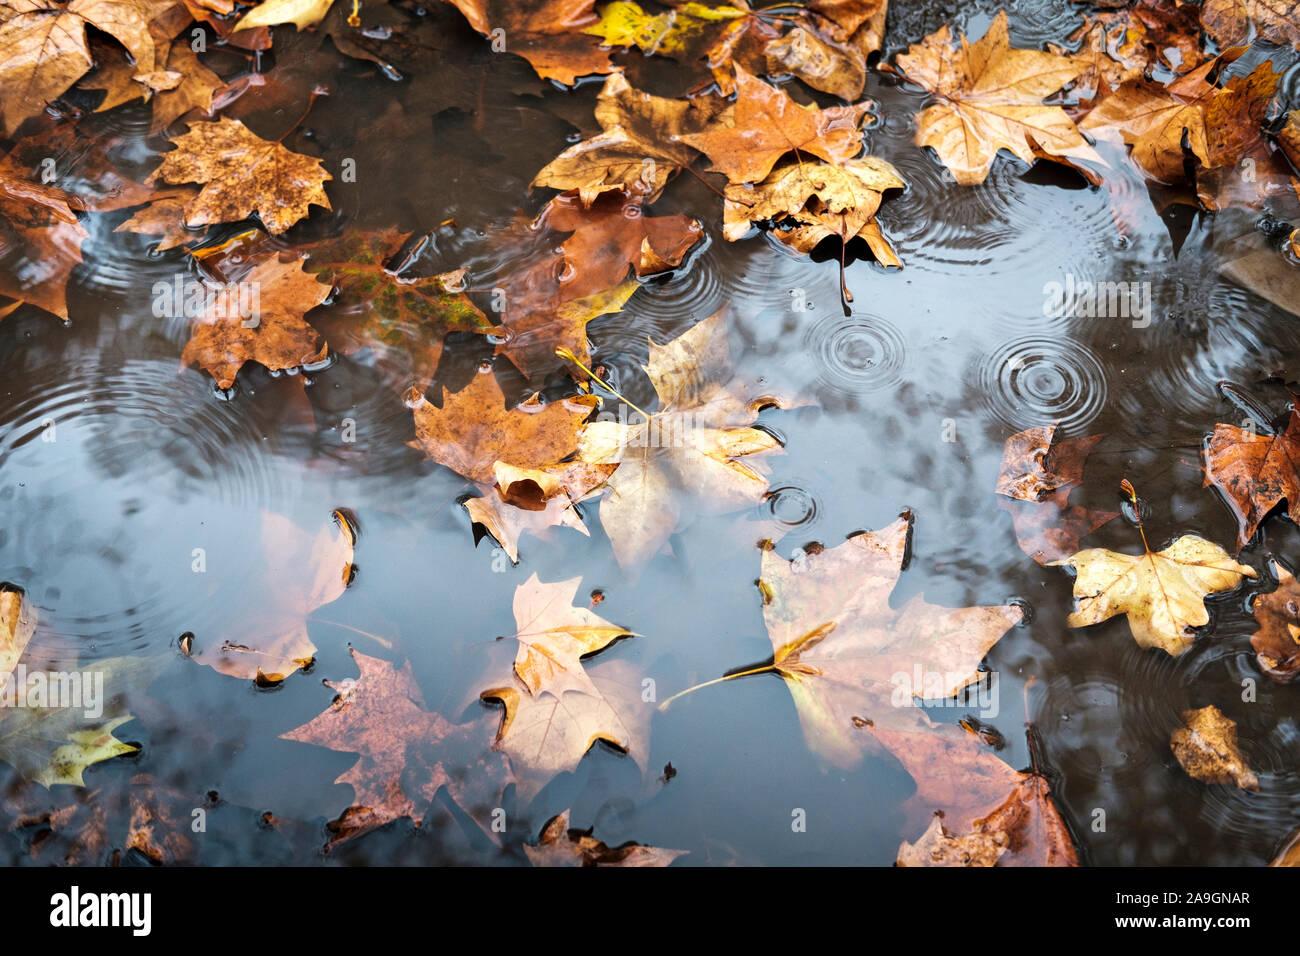 rain puddle and fallen leaves,End of Novemebr, London,UK Stock Photo